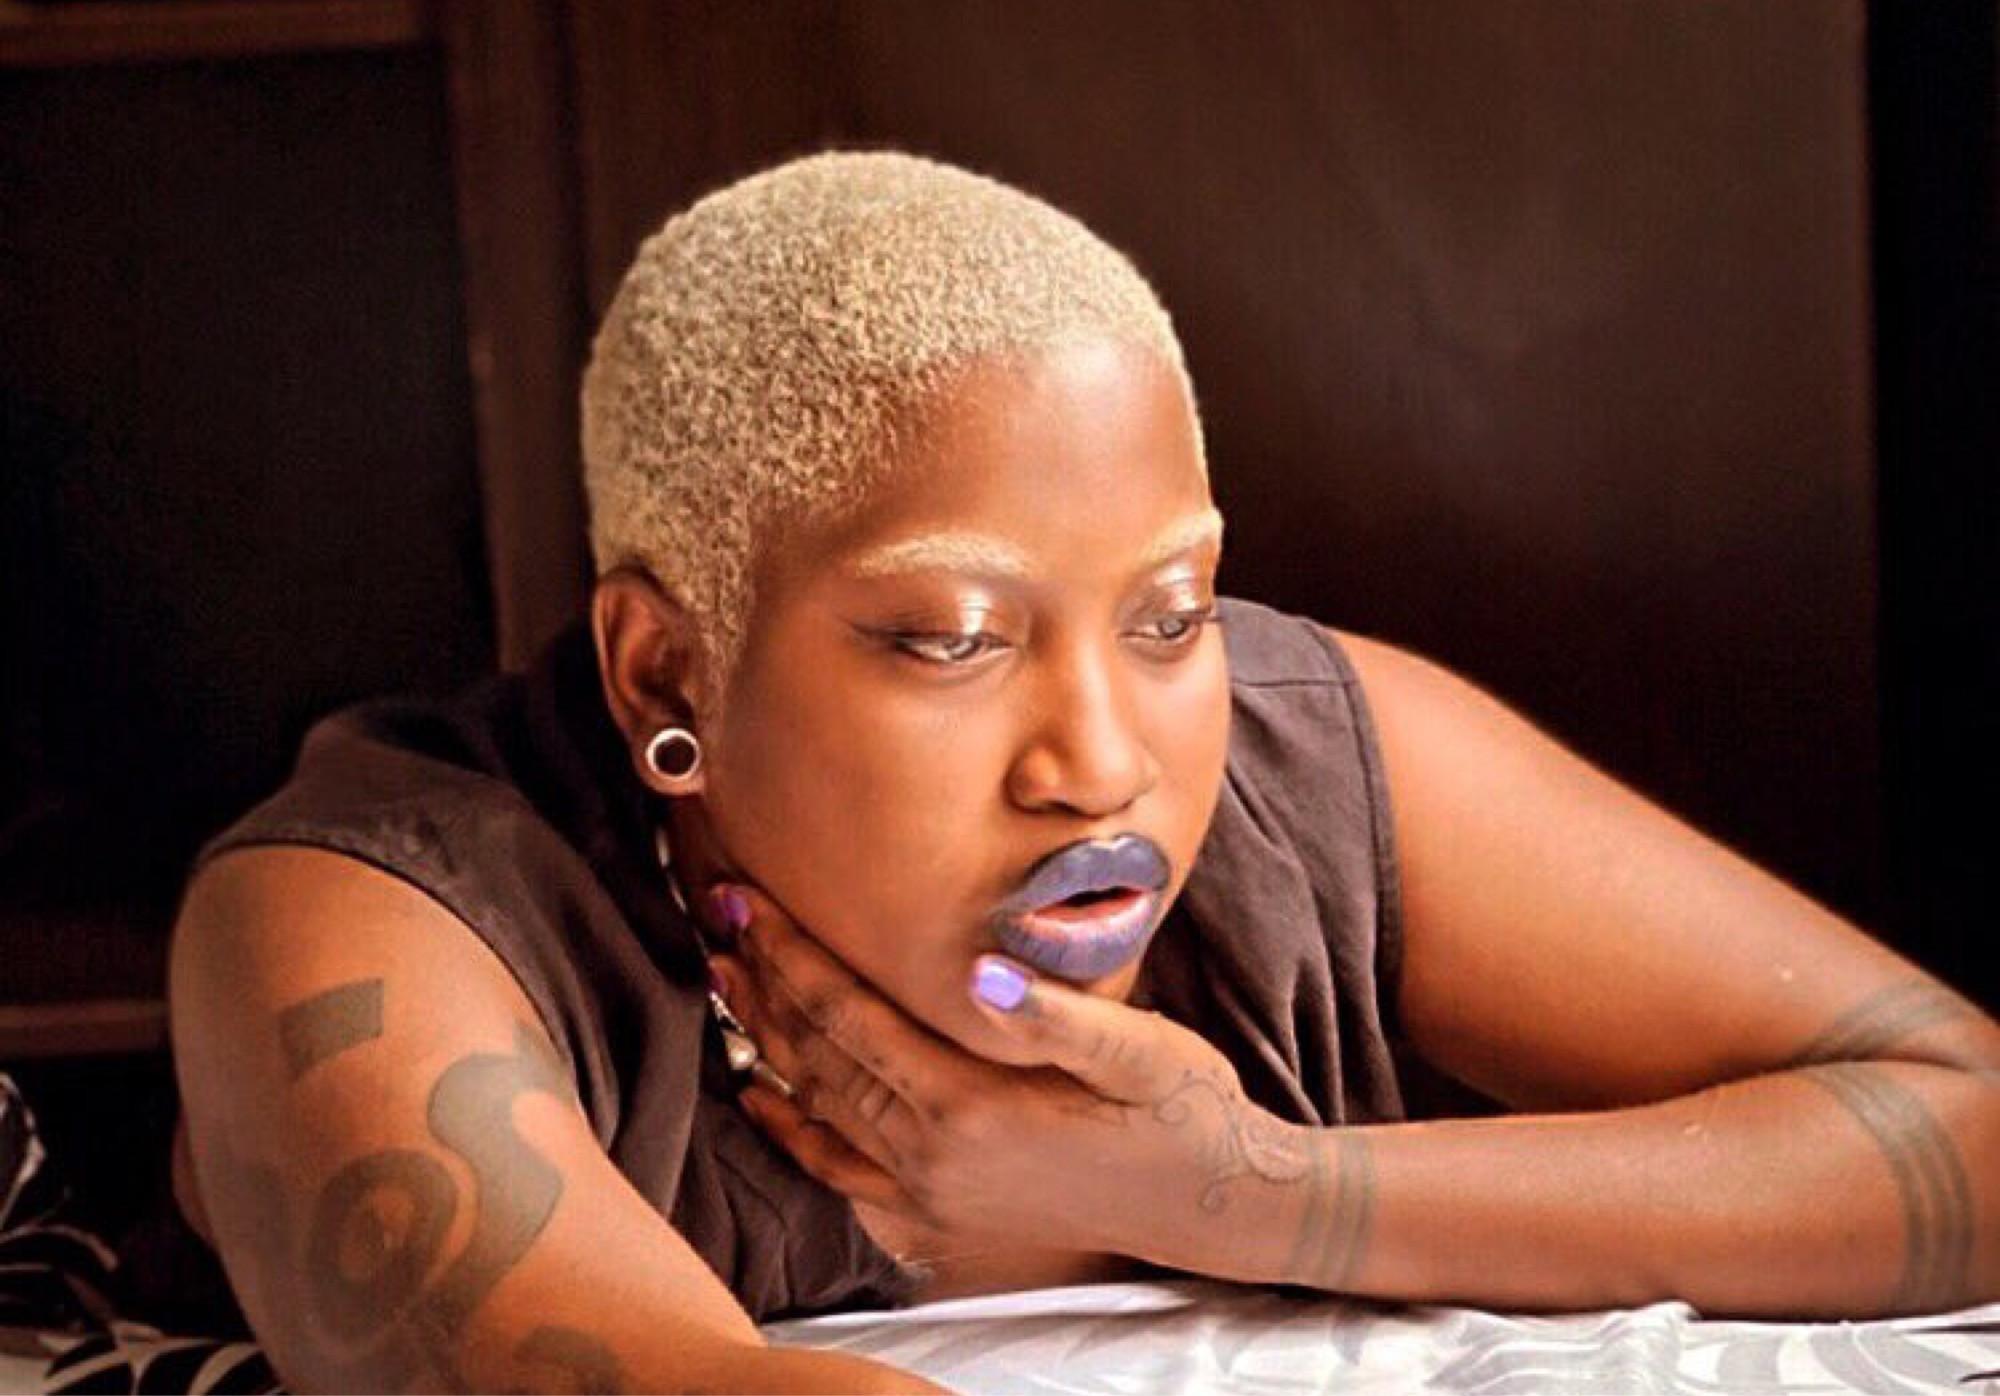 Nigerian men don?t deserve free s*x, always charge them - Singer Temmie Ovwasa tells women